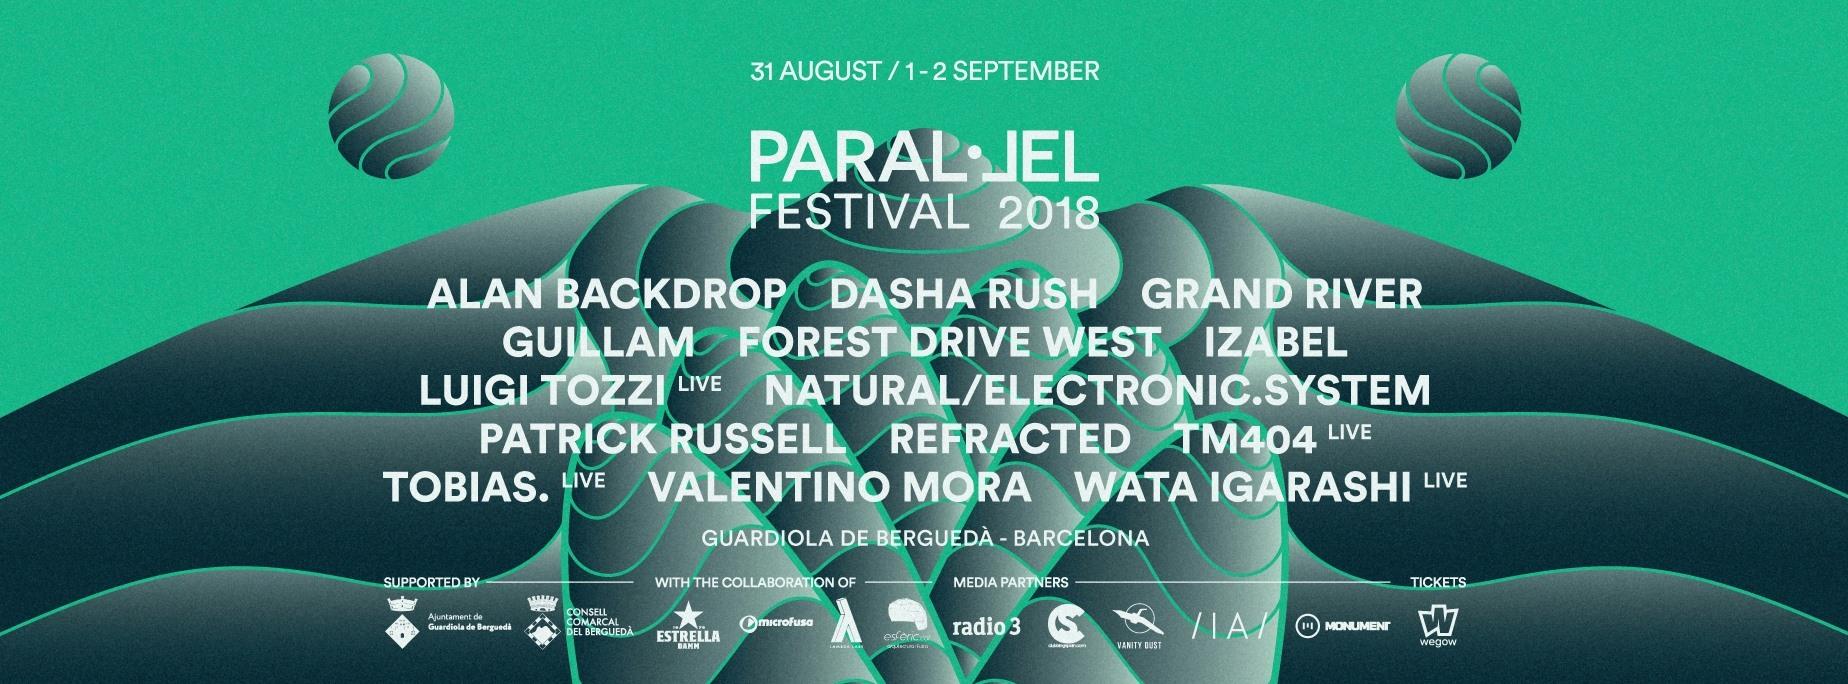 Parallel Festival Lineup 2018.jpg